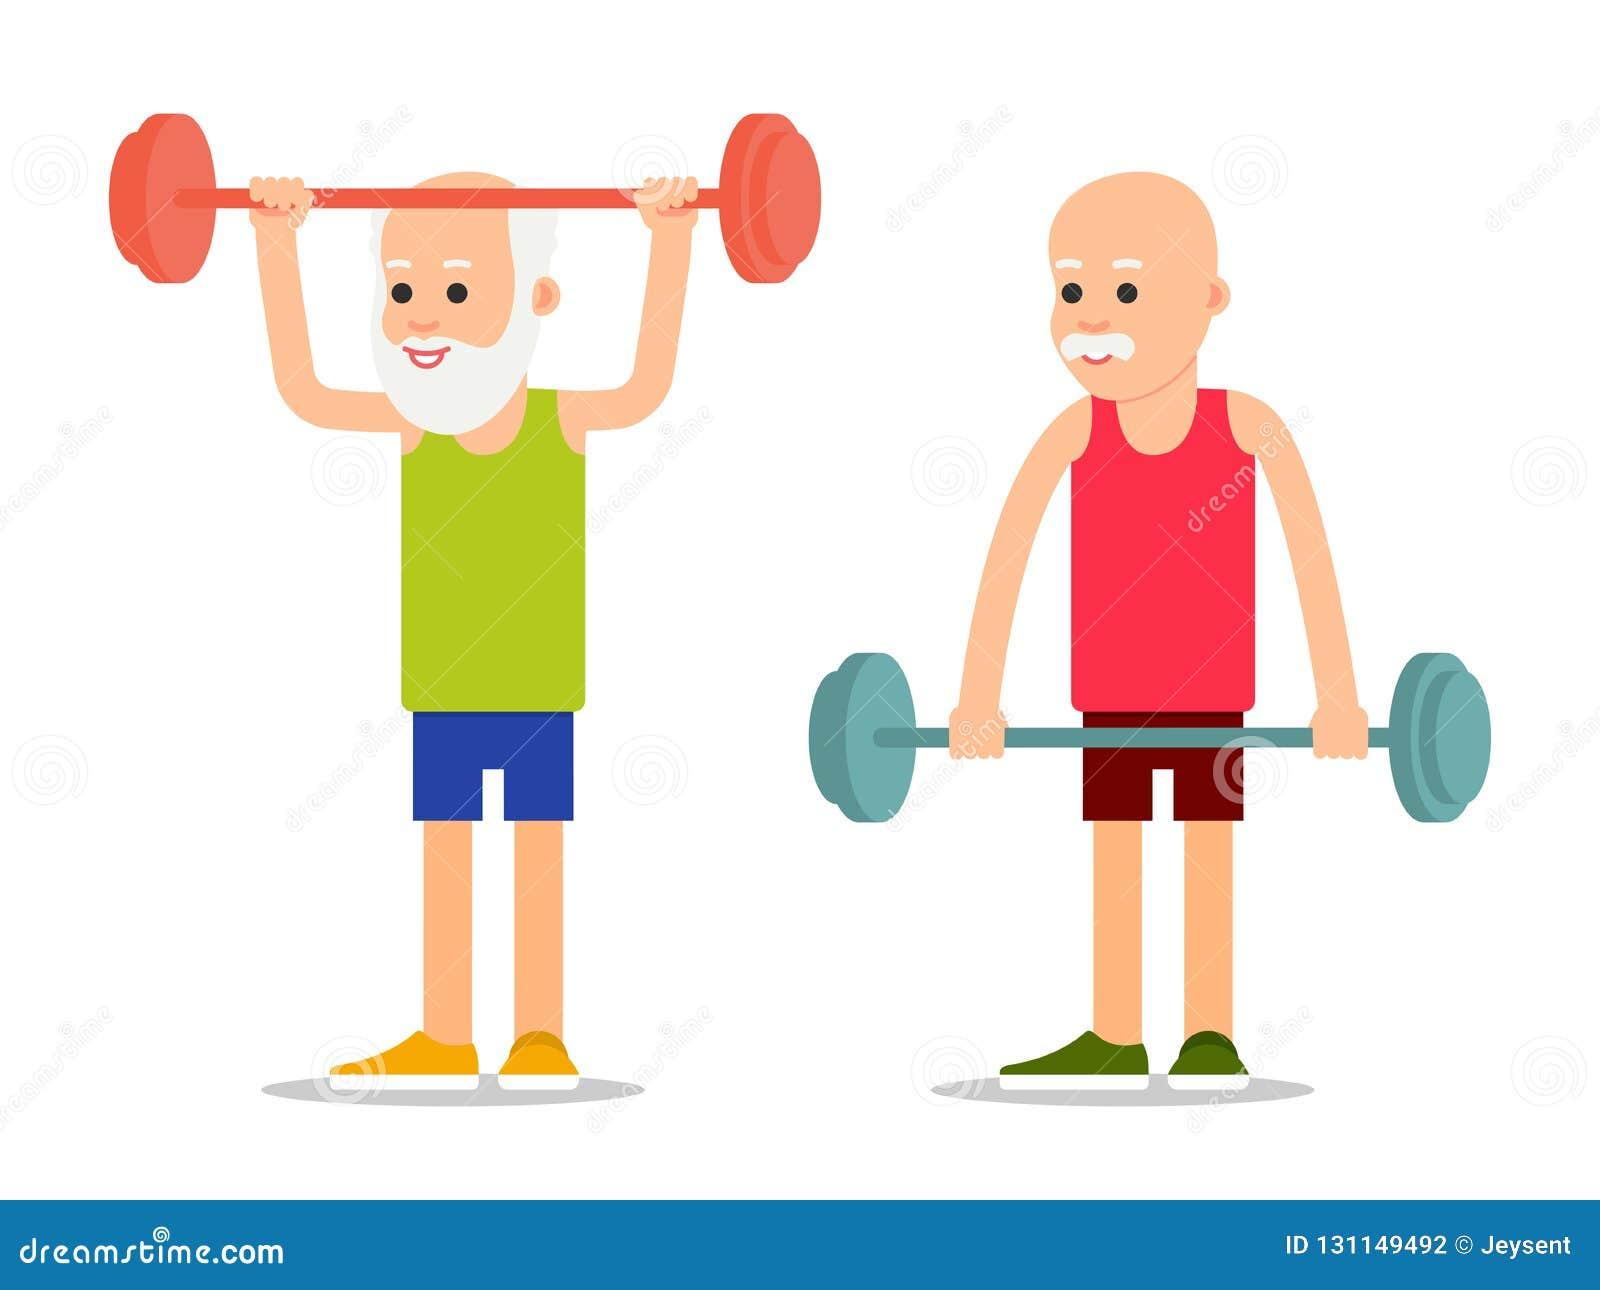 La persona anziana si esercita al sollevamento del bilanciere Sportsm anziano